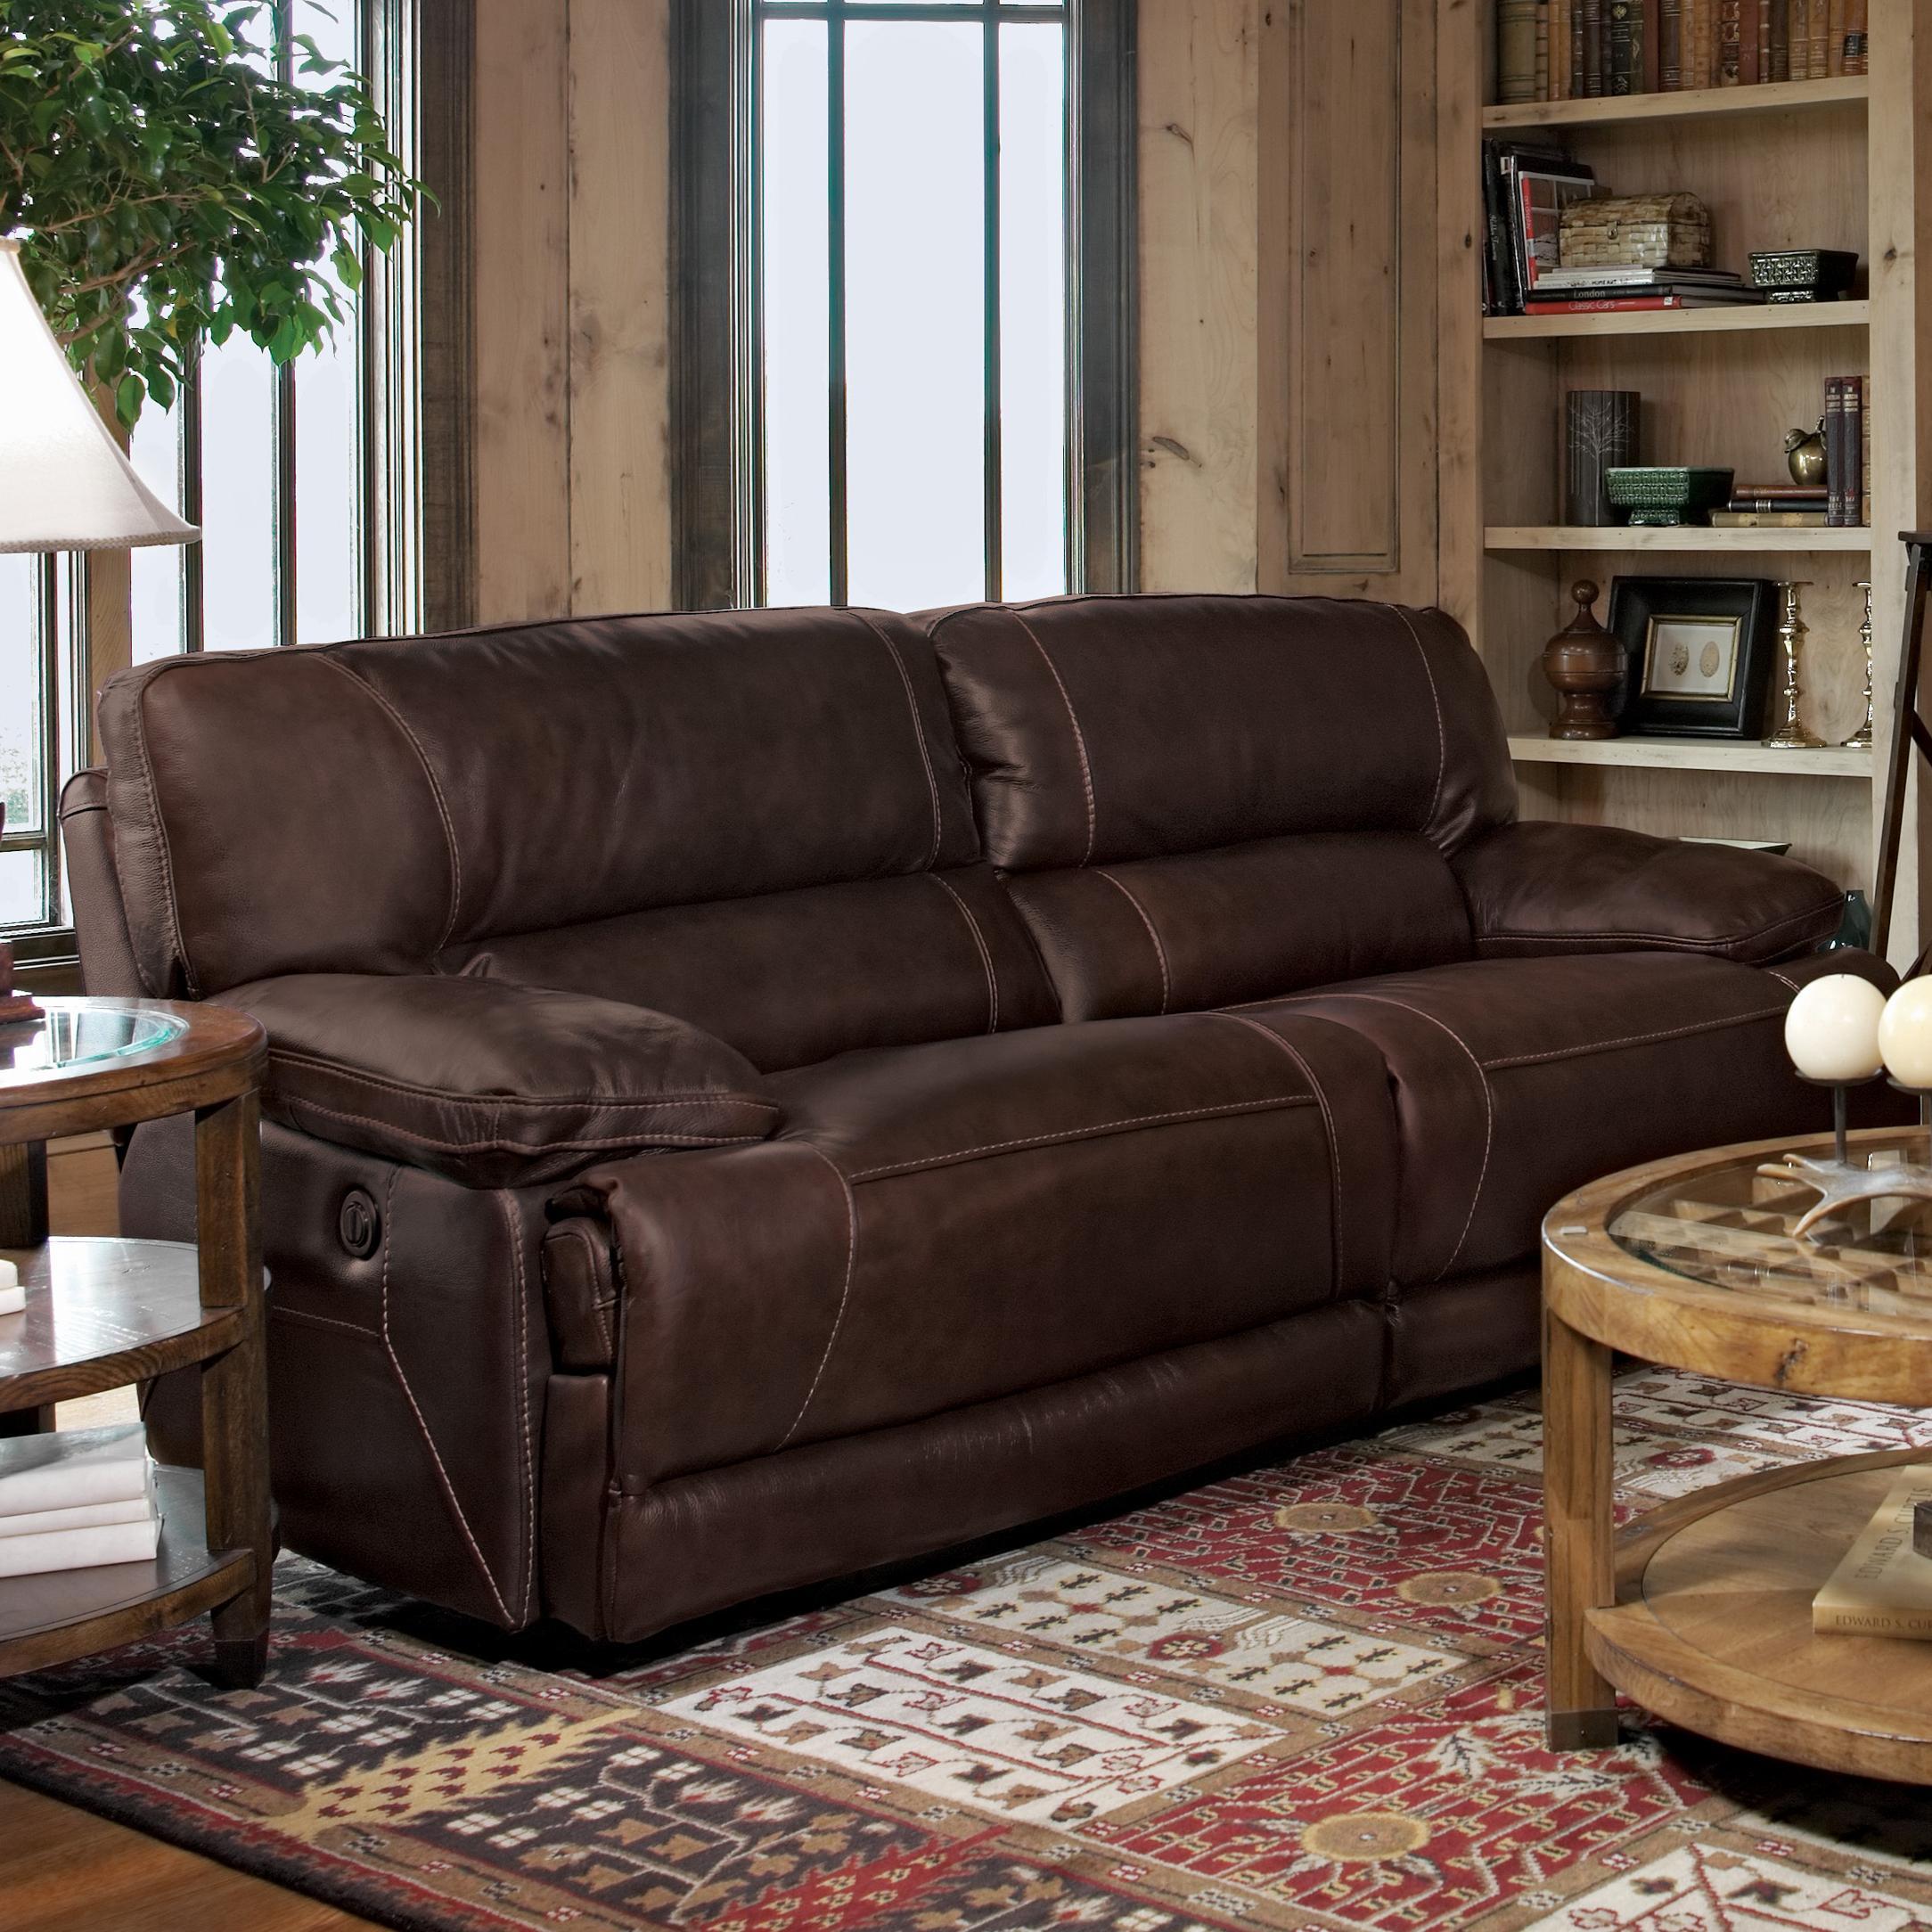 flexsteel capitol double reclining sofa white cotton slipcover for laudes miles